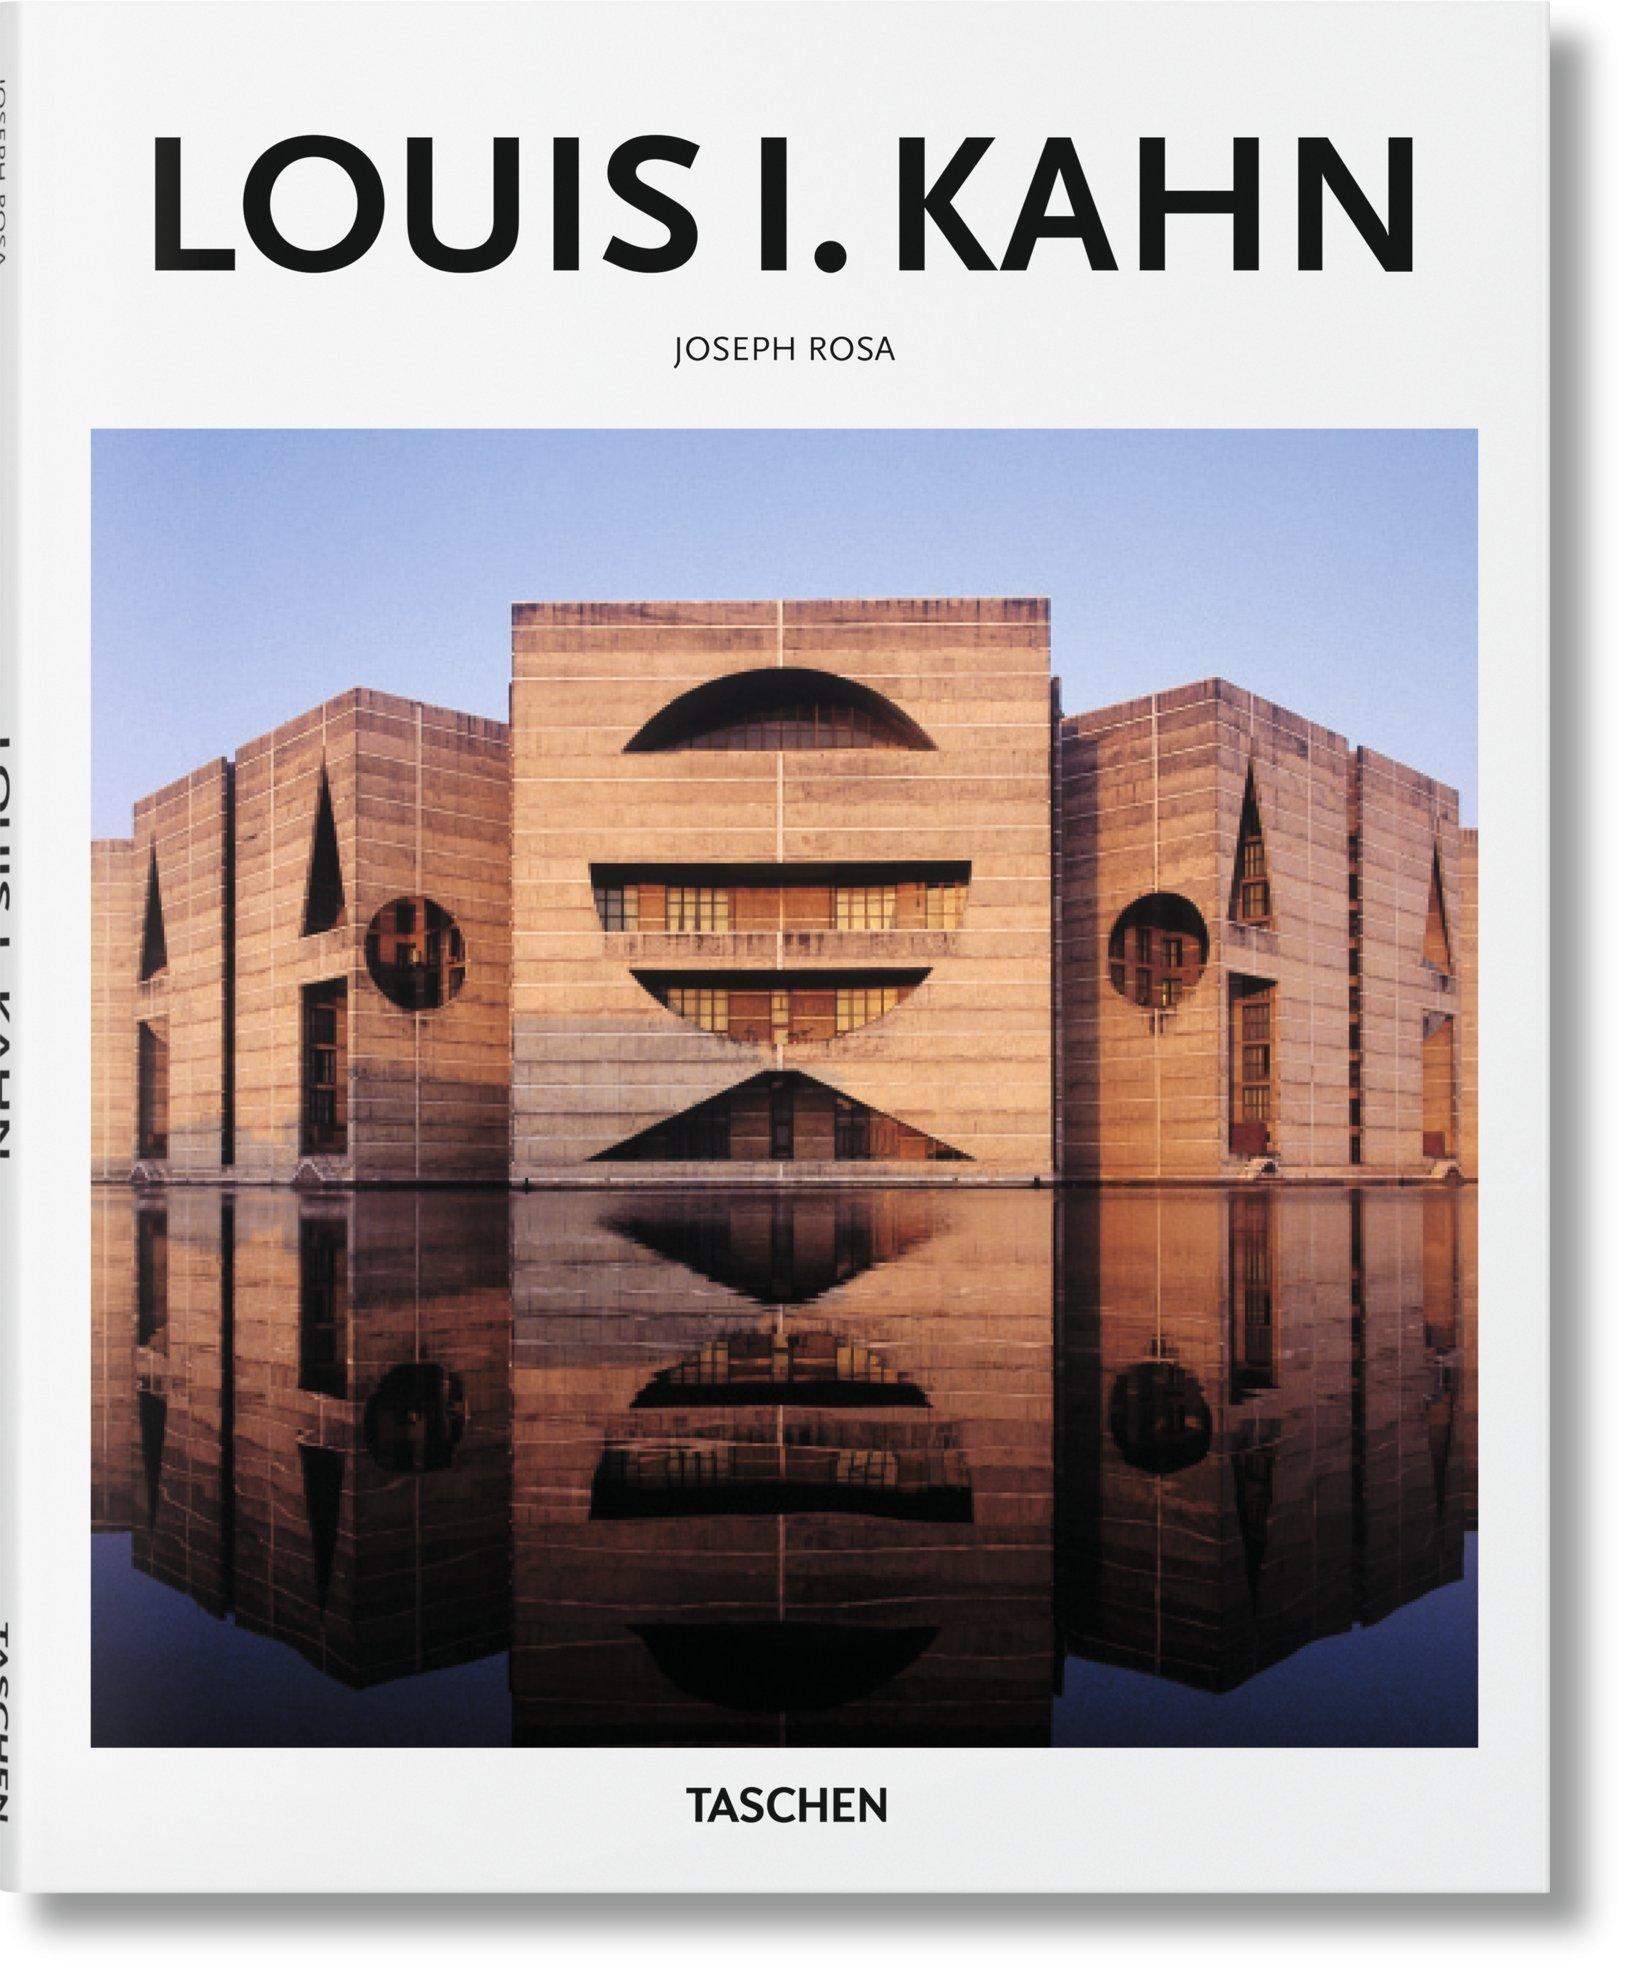 Louis I. Kahn : 1901-1974- Enlightened Space